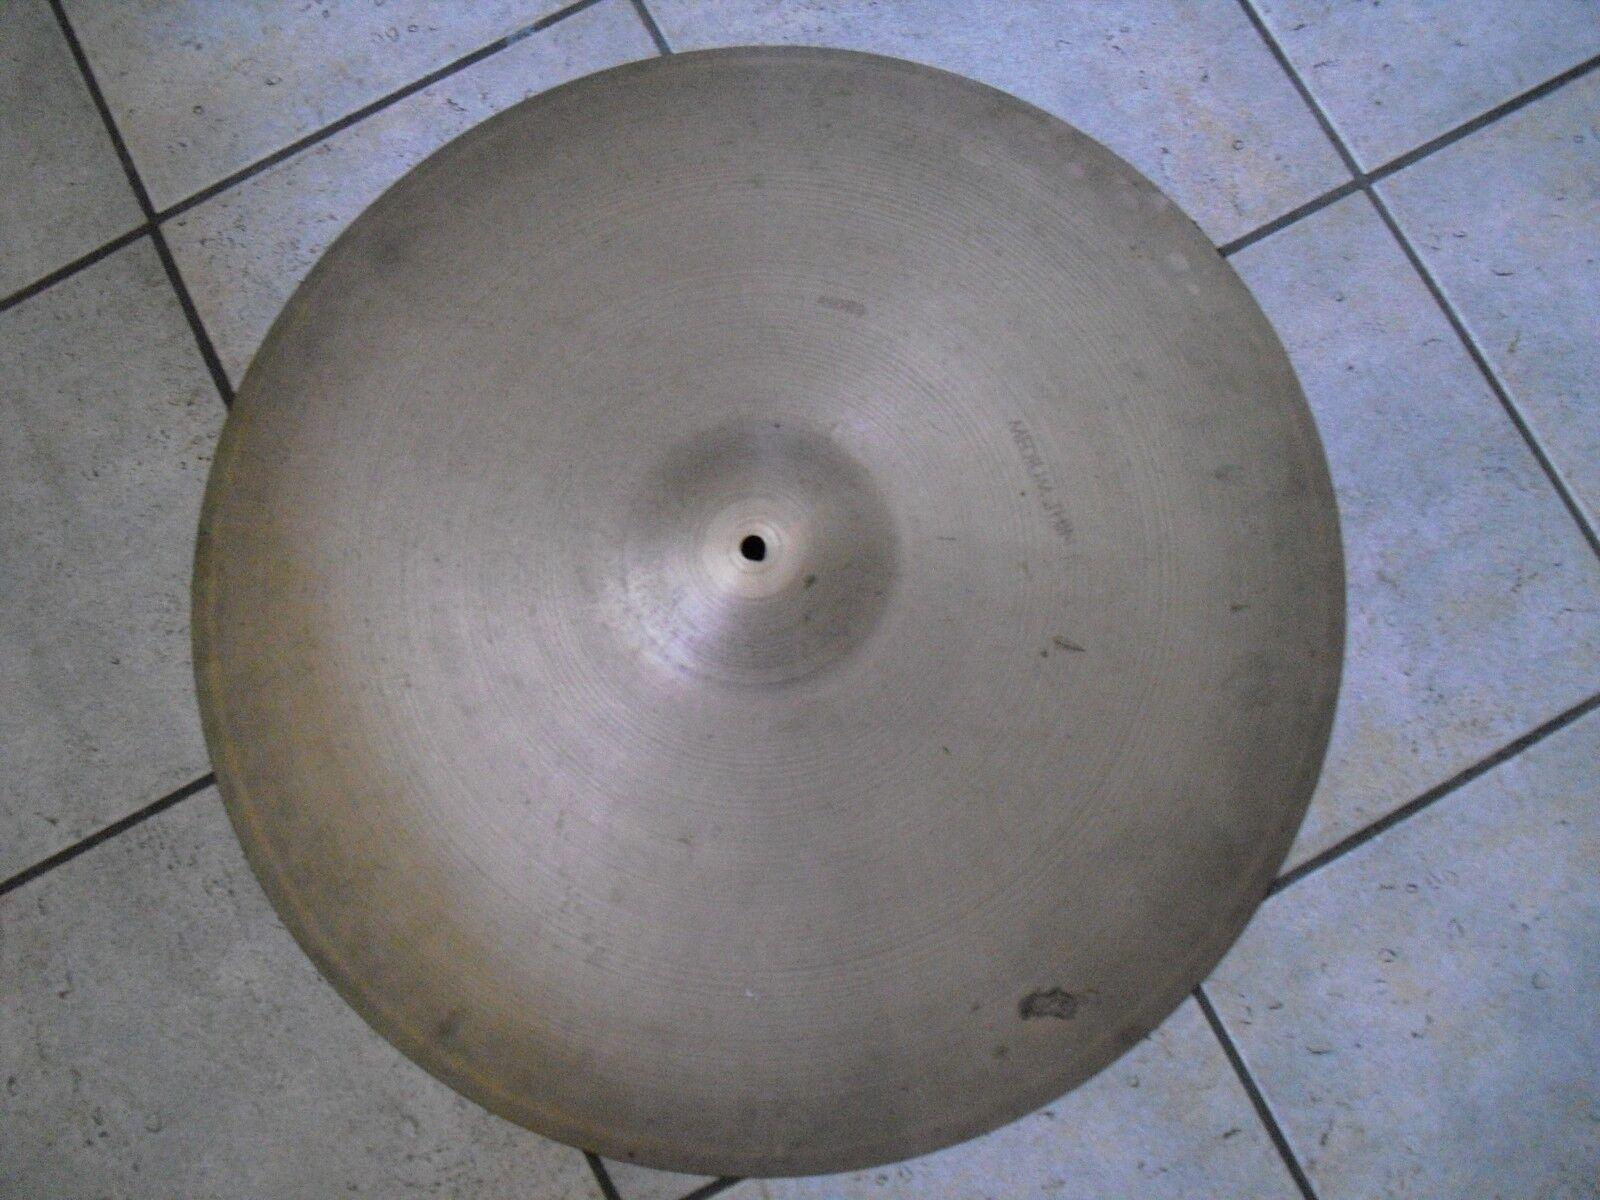 24  Vintage 70s thin stamp Avedis Zildjian Medium Thin Ride Cymbal 3550g